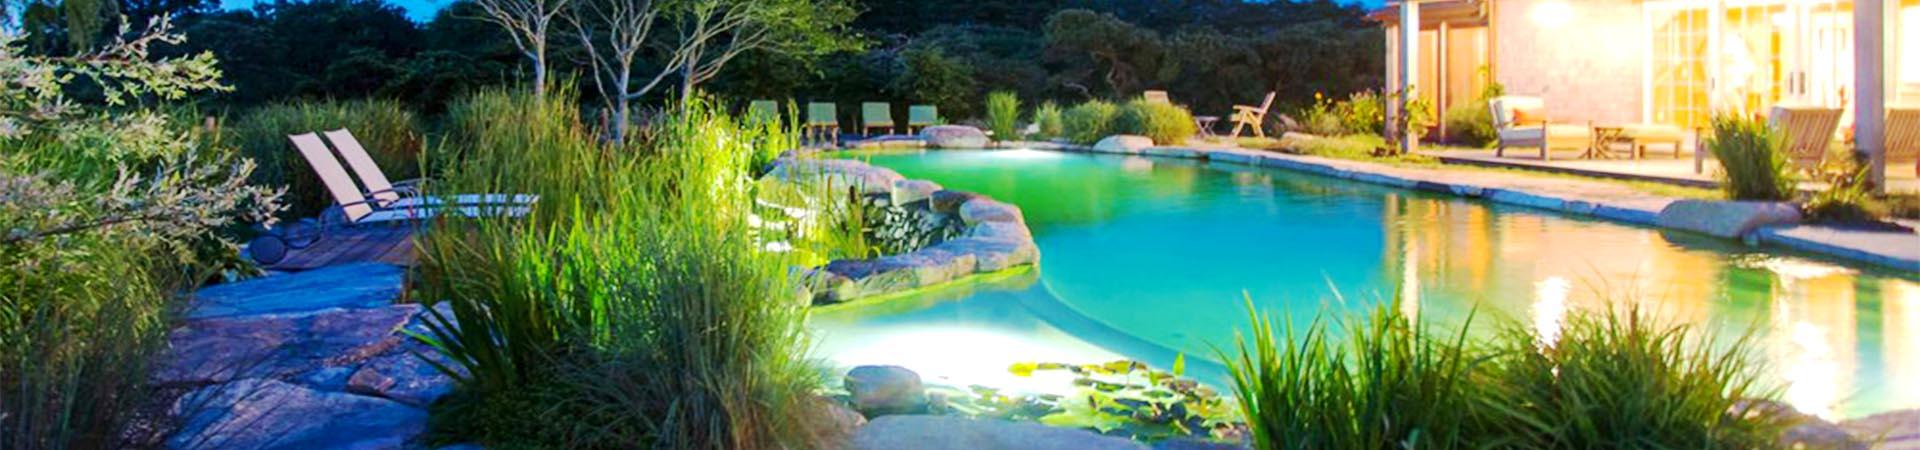 Azulverde Pools